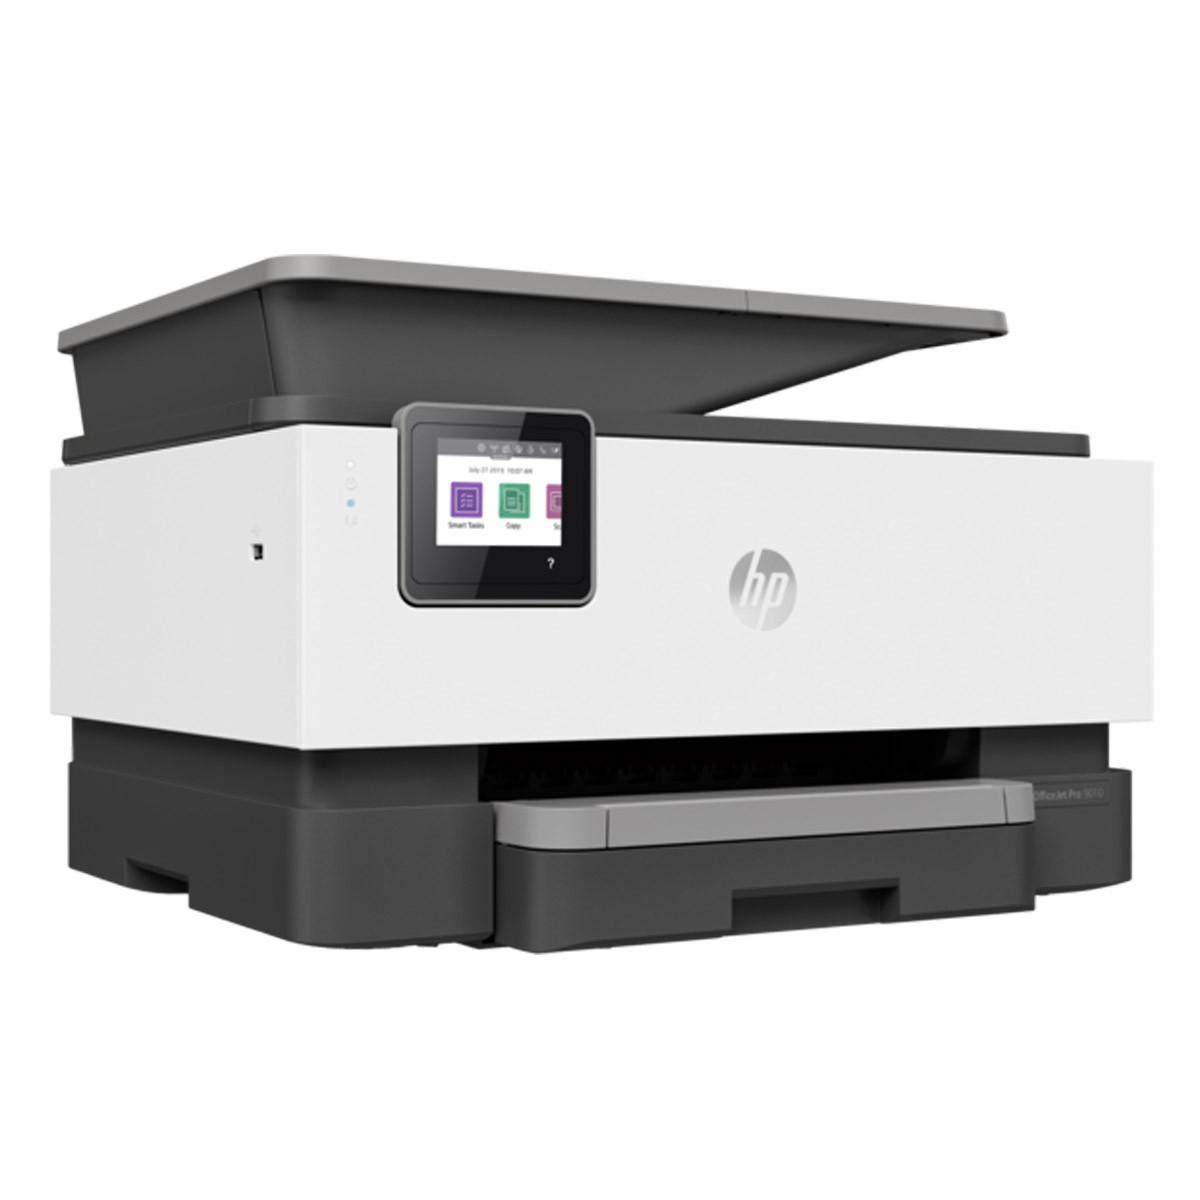 Impressora HP OfficeJet Pro 9010 1KR46C Multifuncional com Wireless